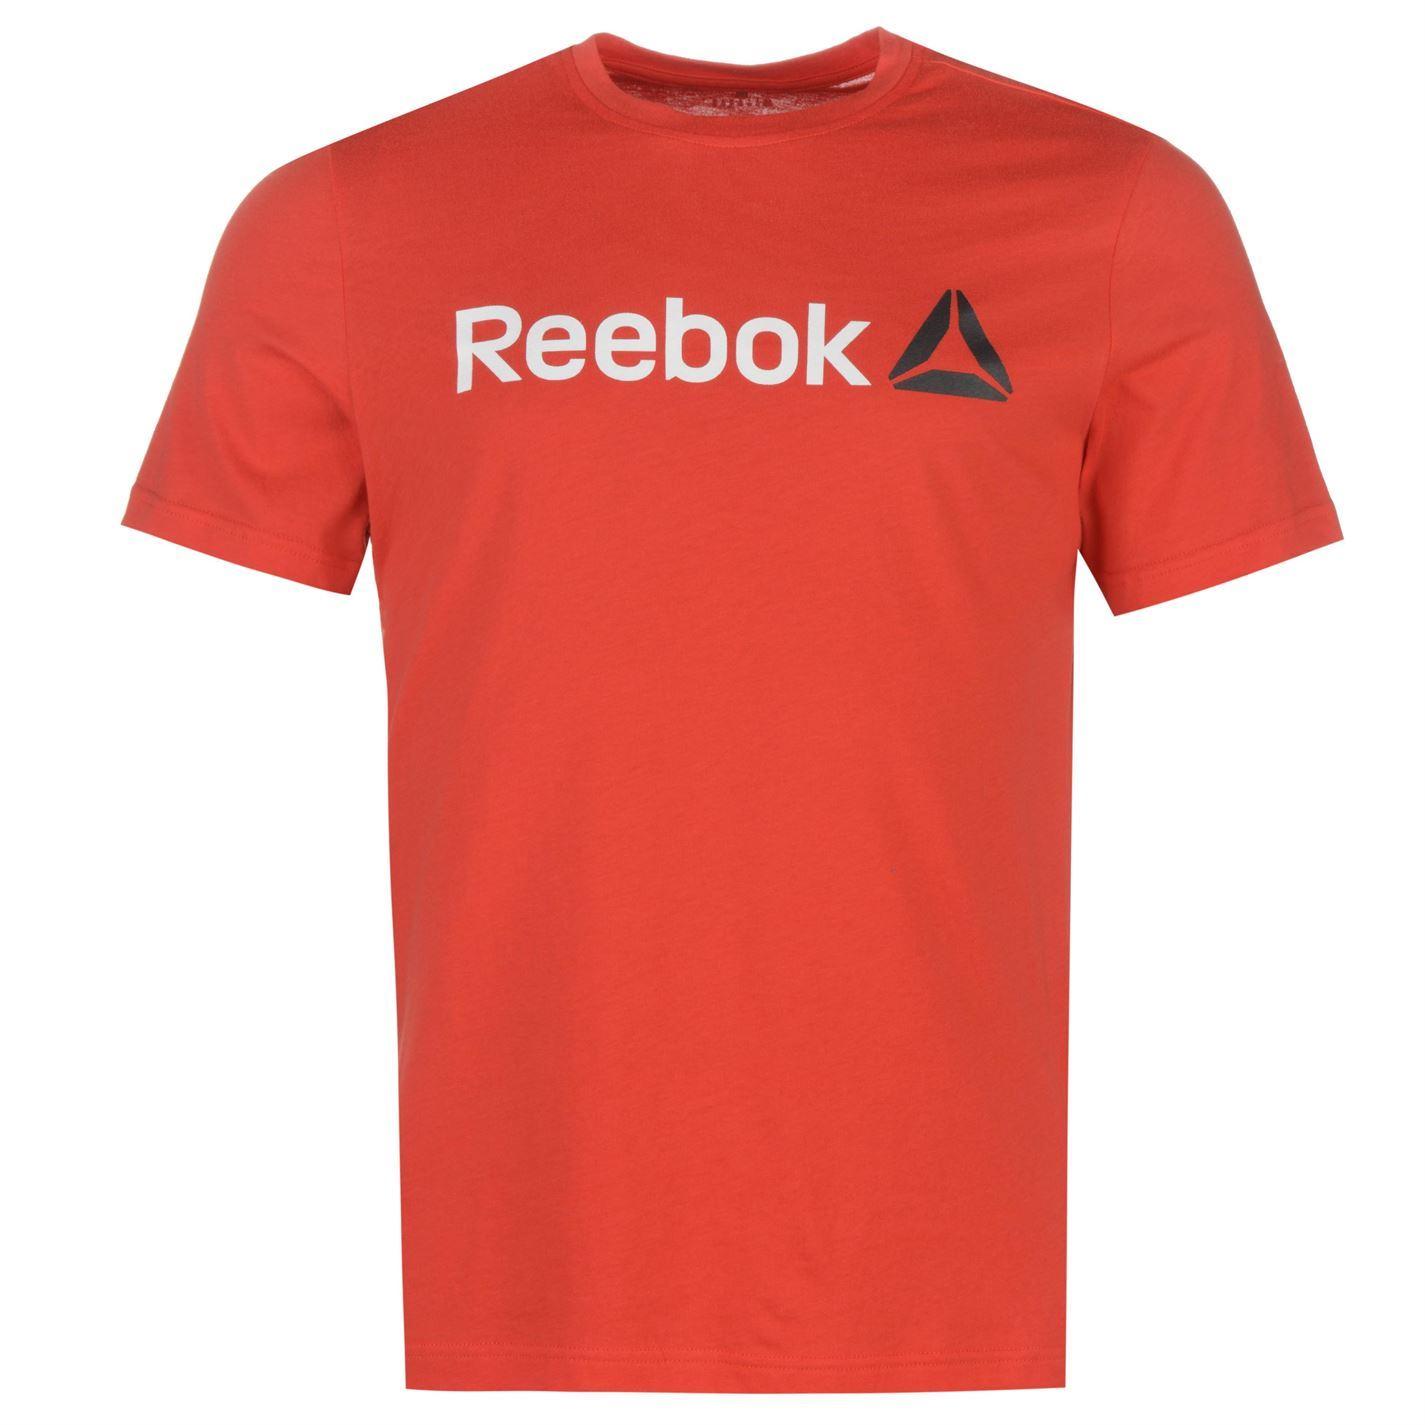 Reebok-Delta-Logo-T-Shirt-Mens-Tee-Shirt-Top thumbnail 31